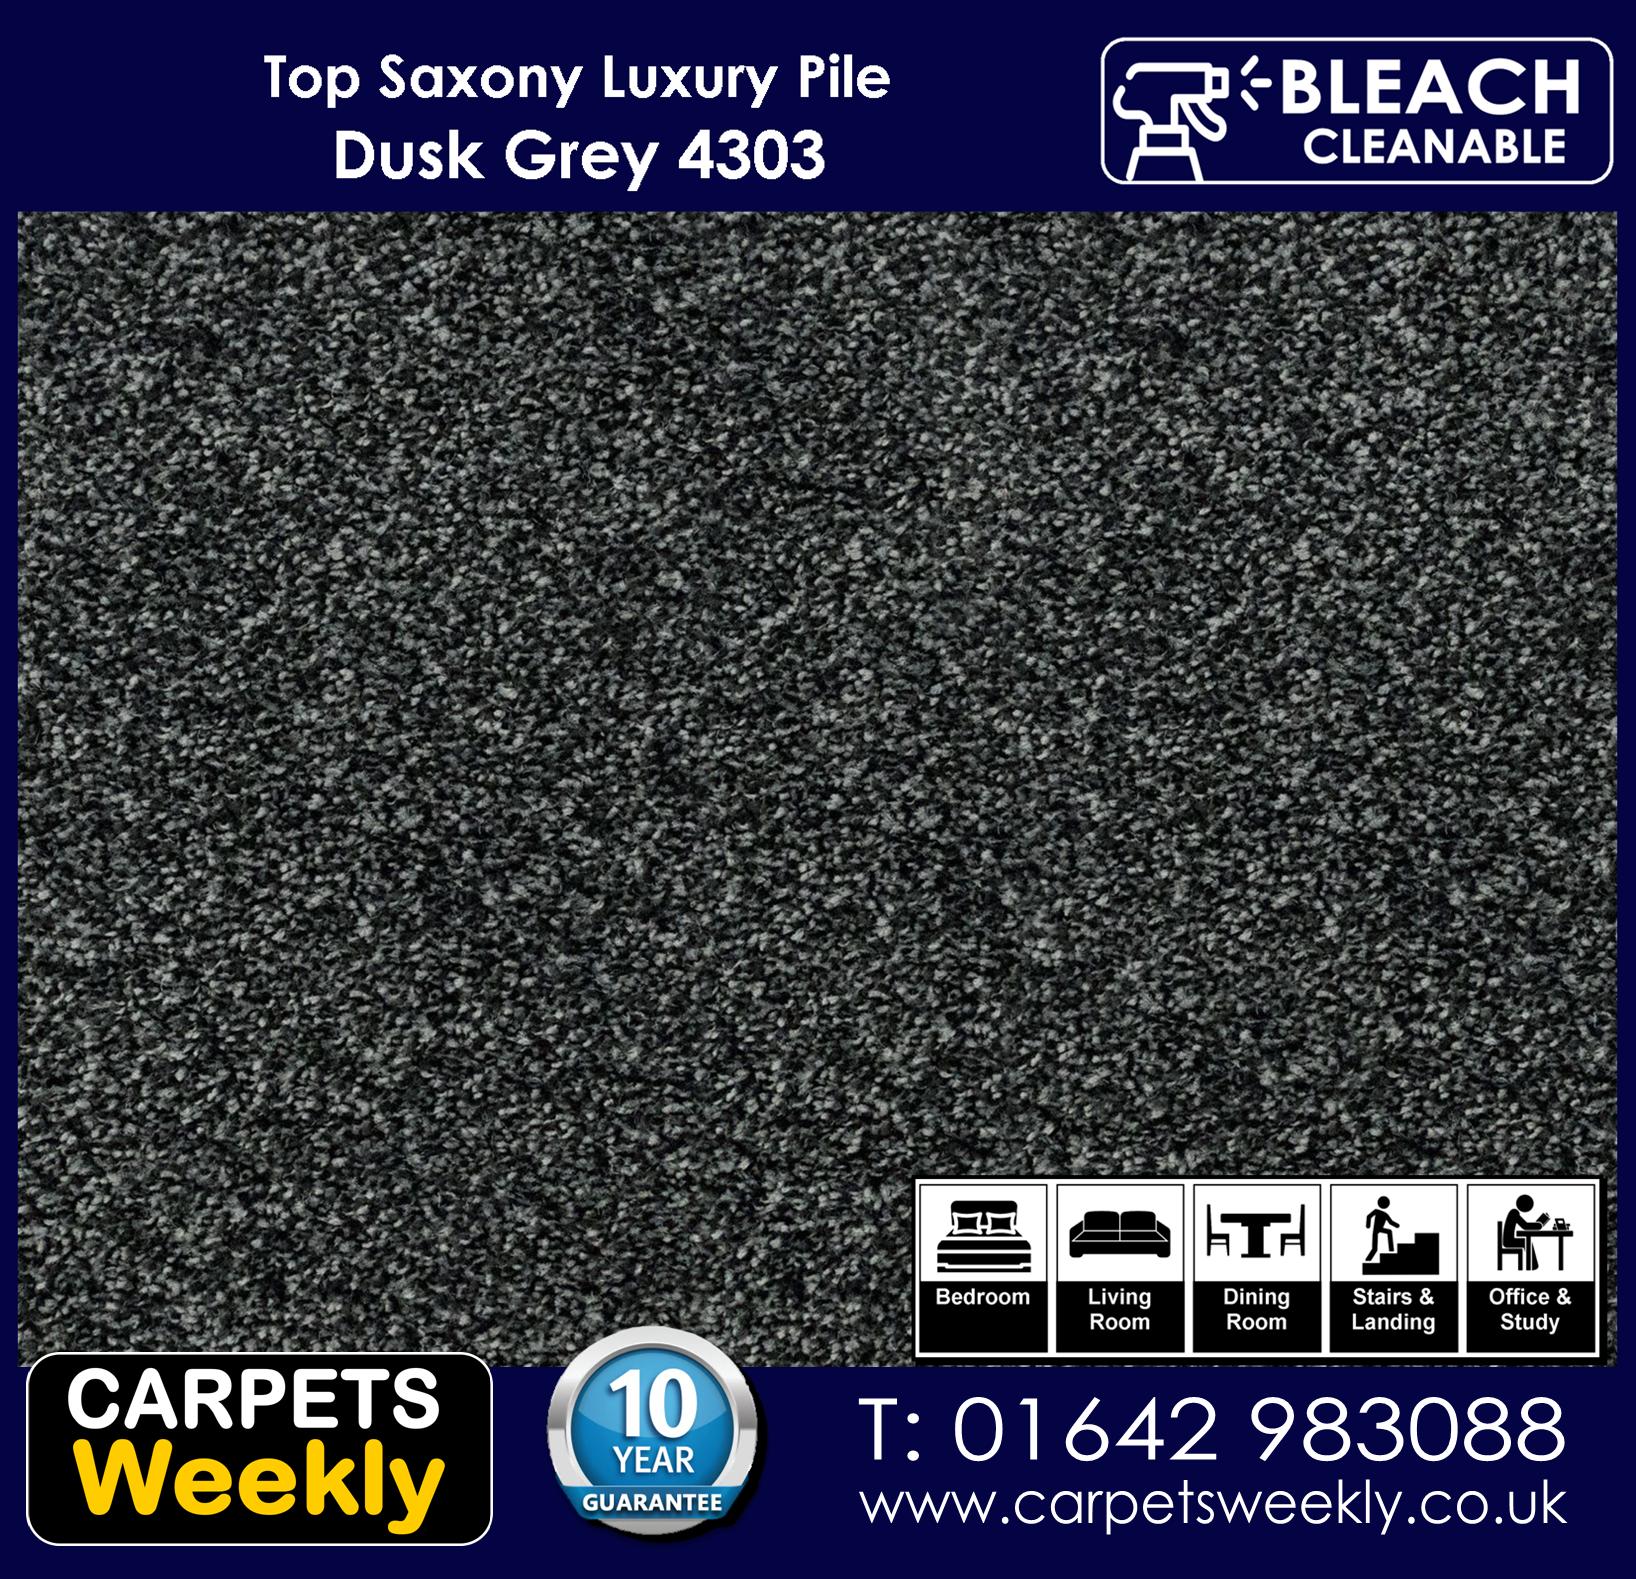 Top Saxony Dusk Grey - 4302 Carpet. Carpets Weekly